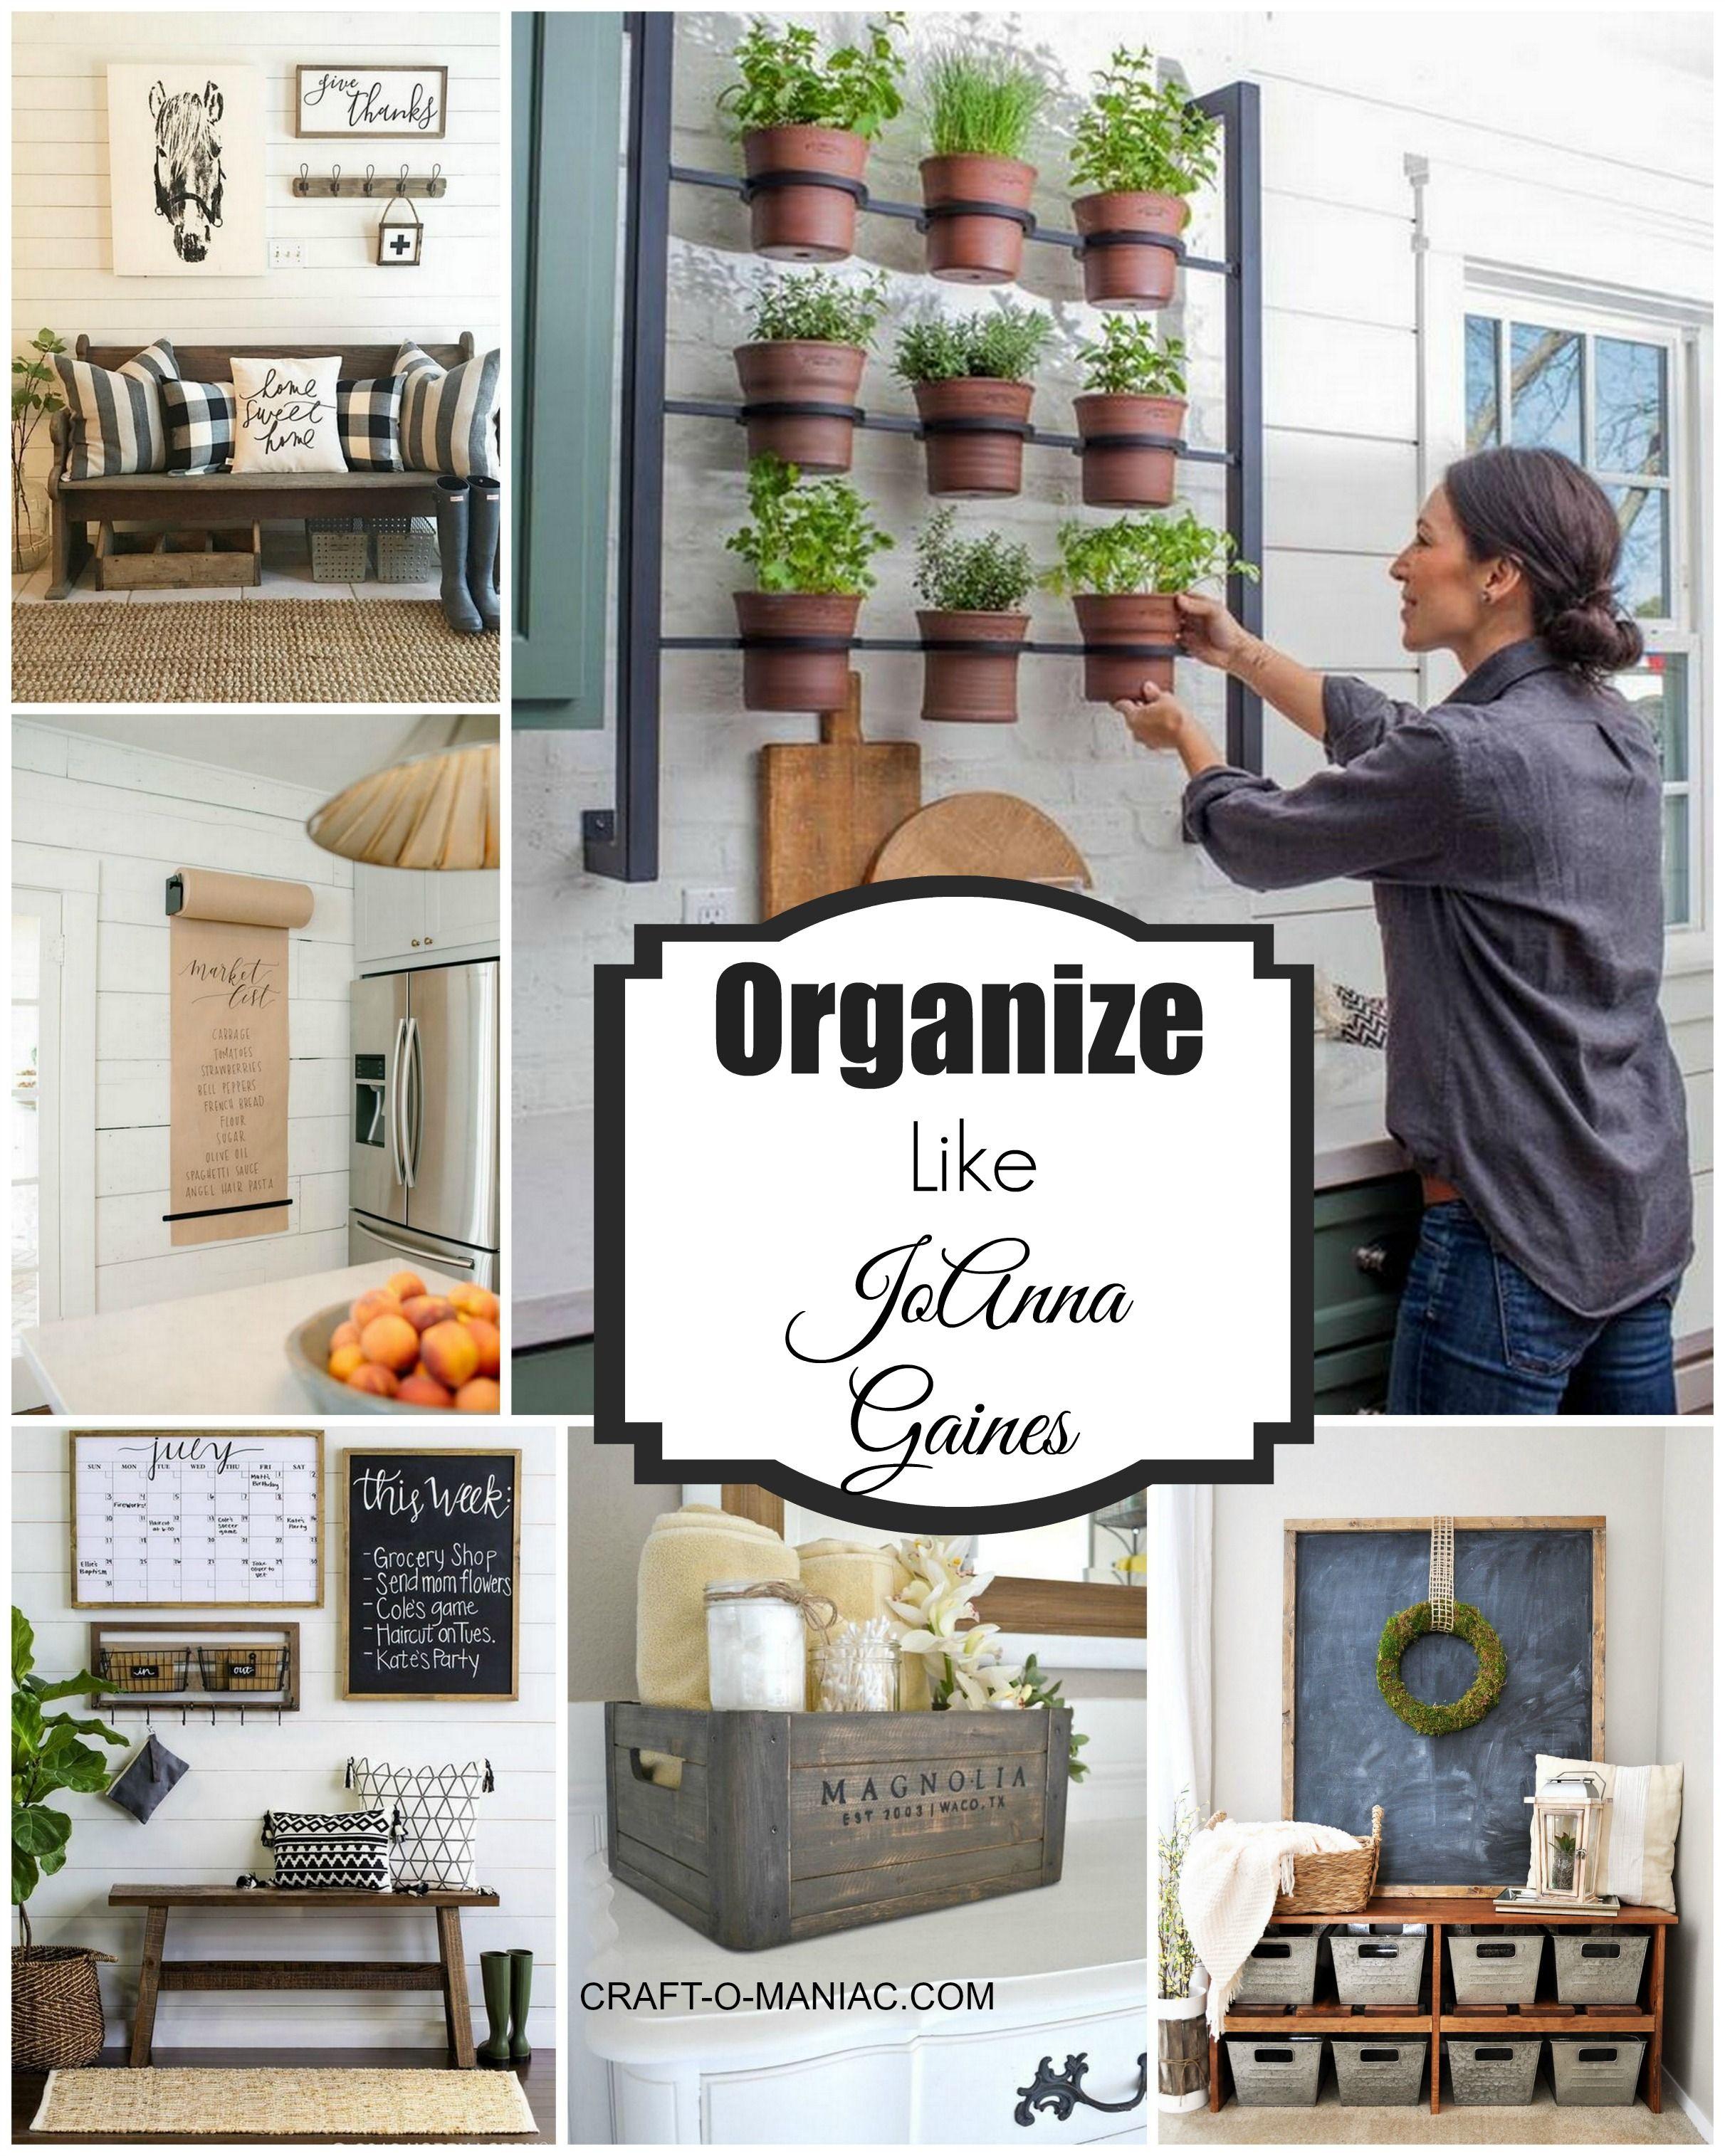 Organize Like Joanna Gaines